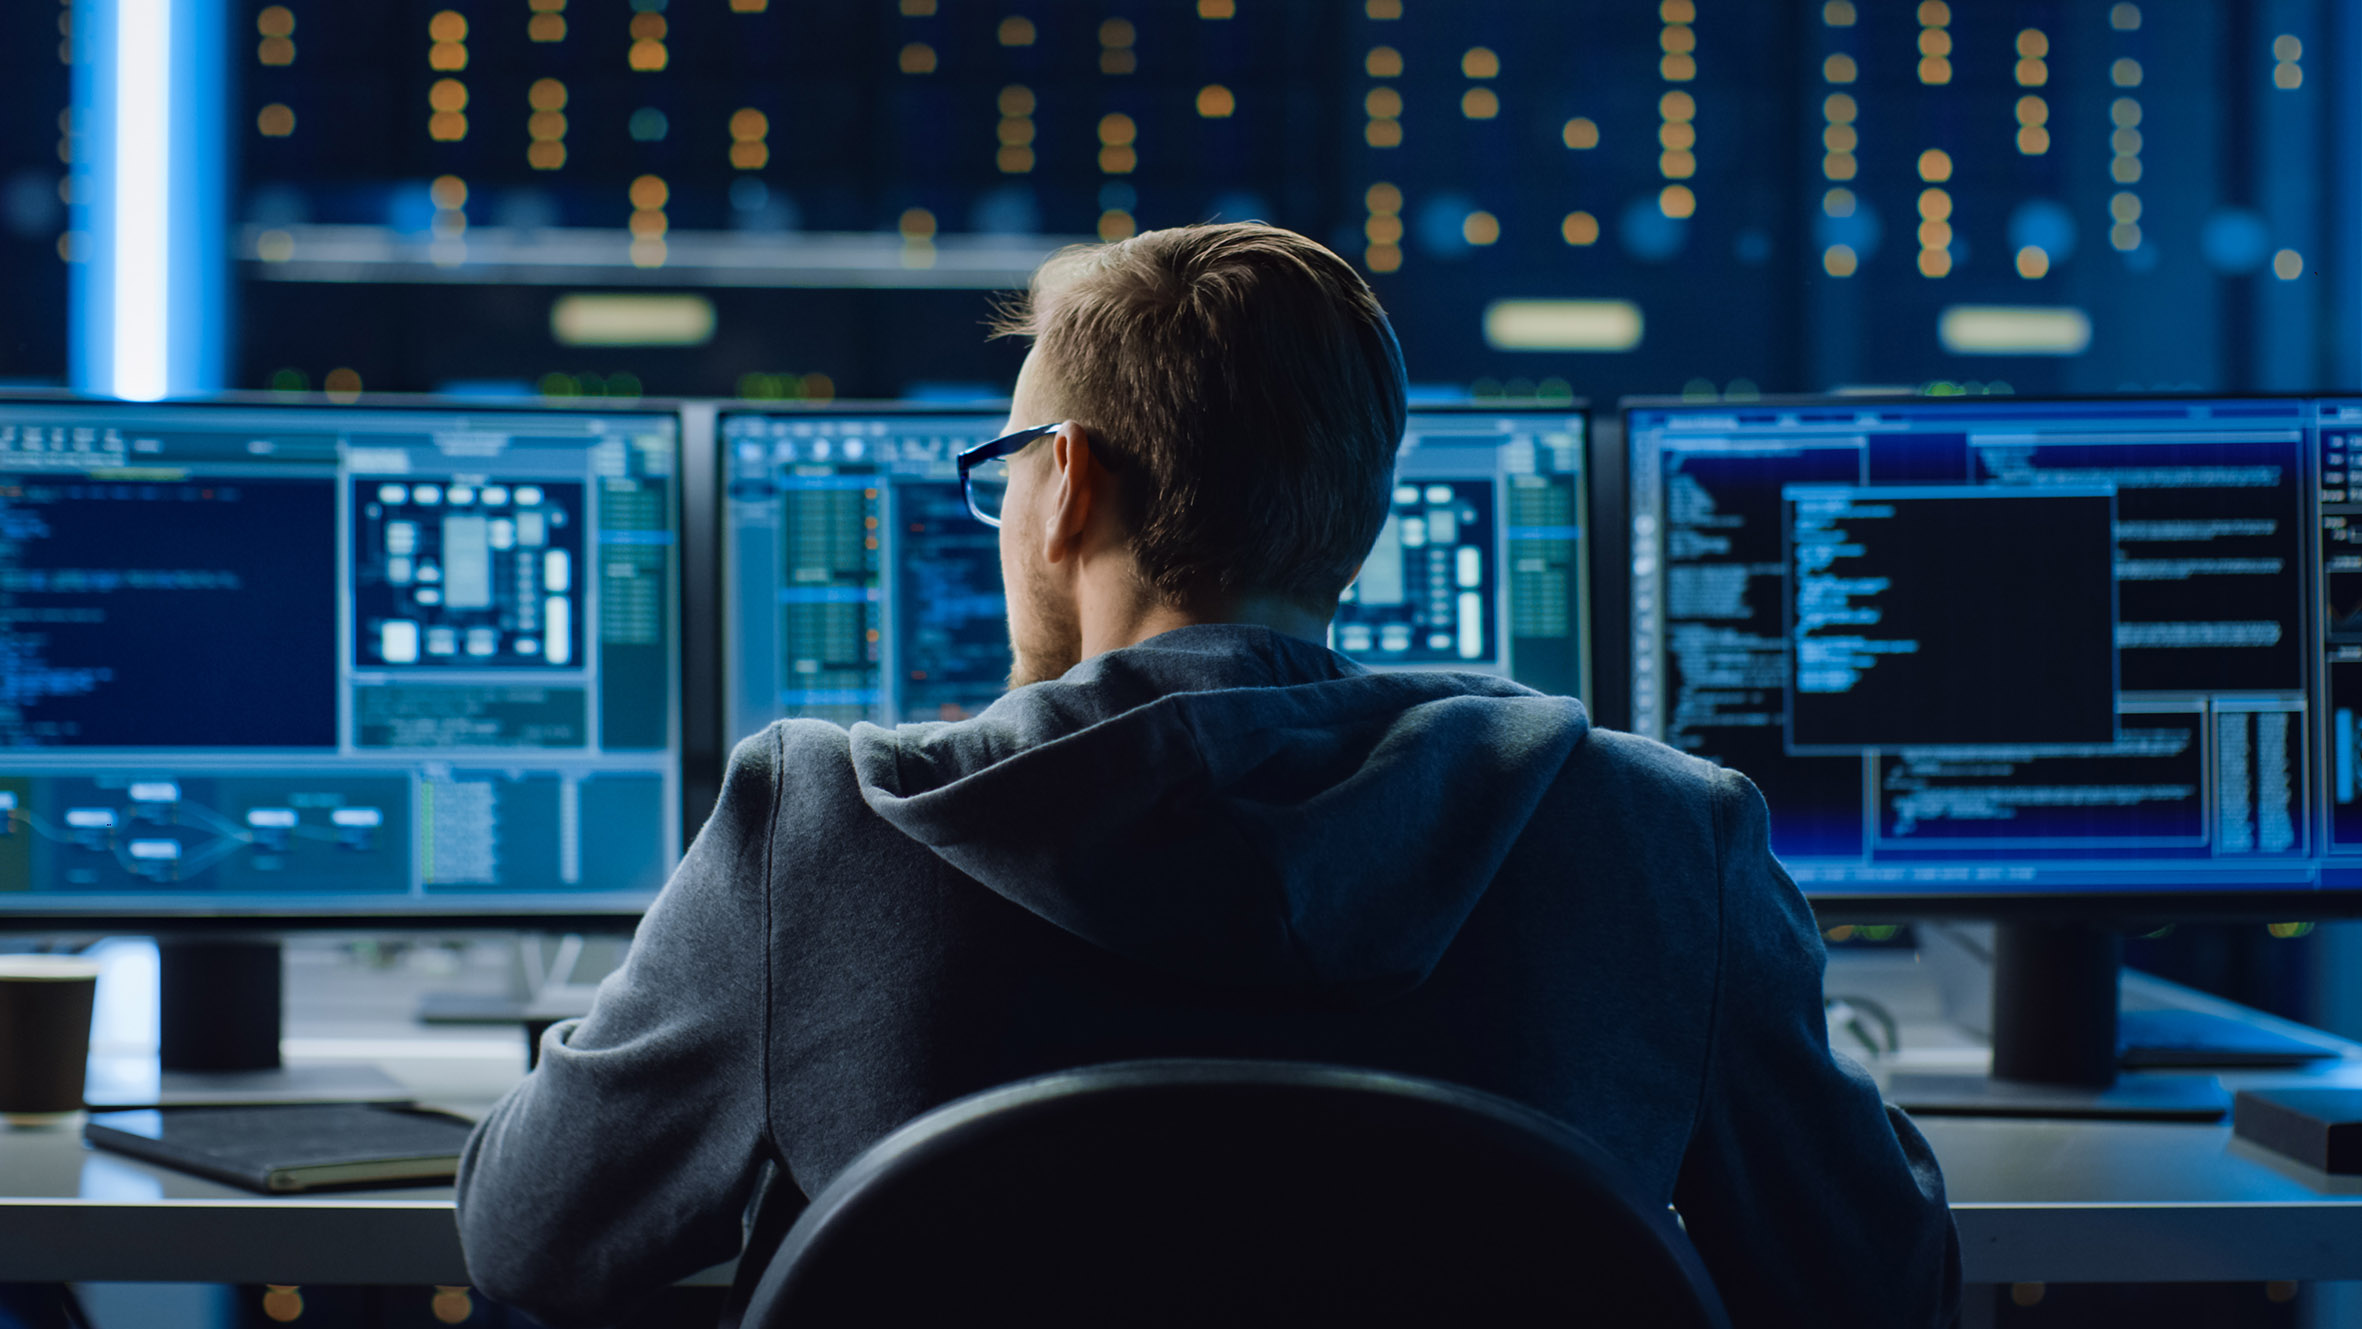 Data centre monitoring